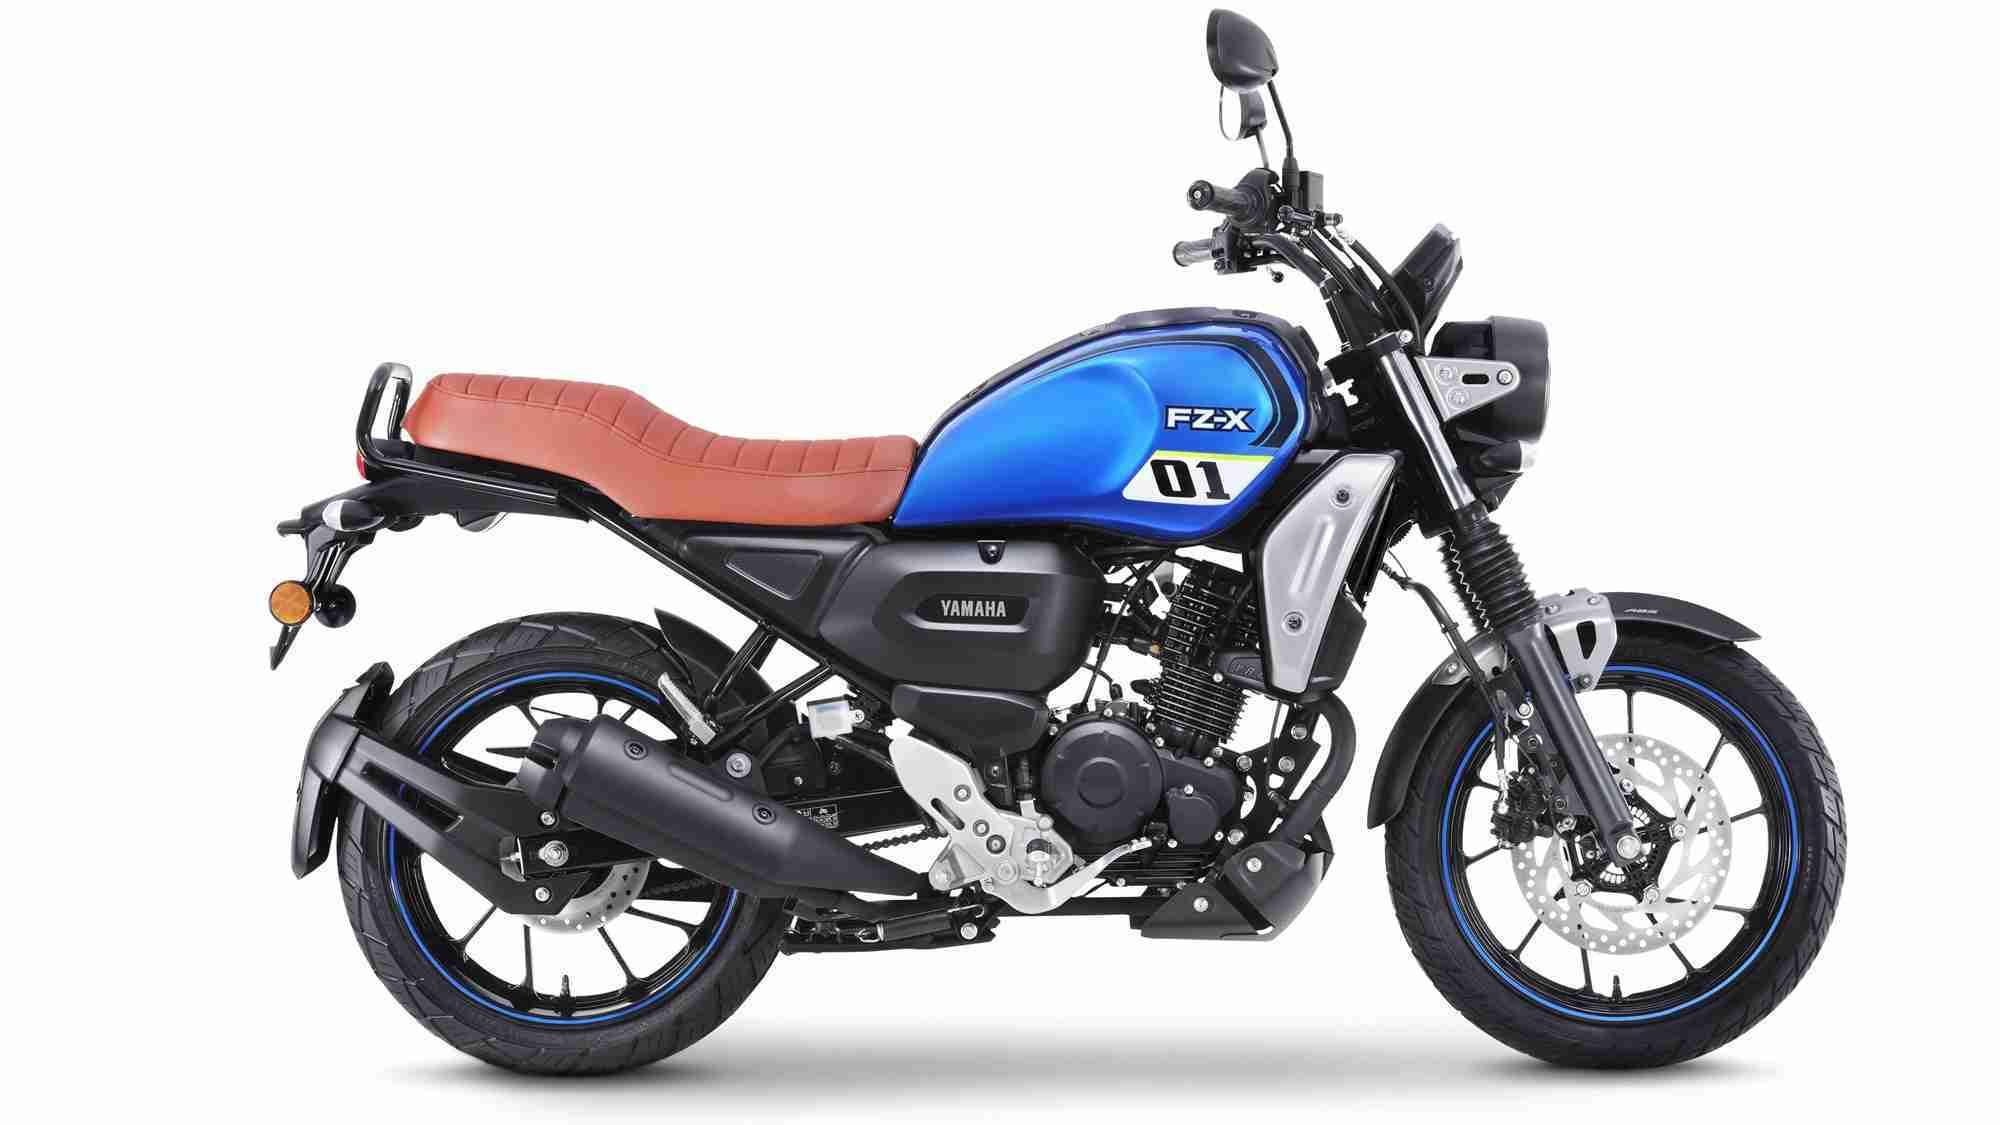 Yamaha FZ-X Metallic Blue colour option